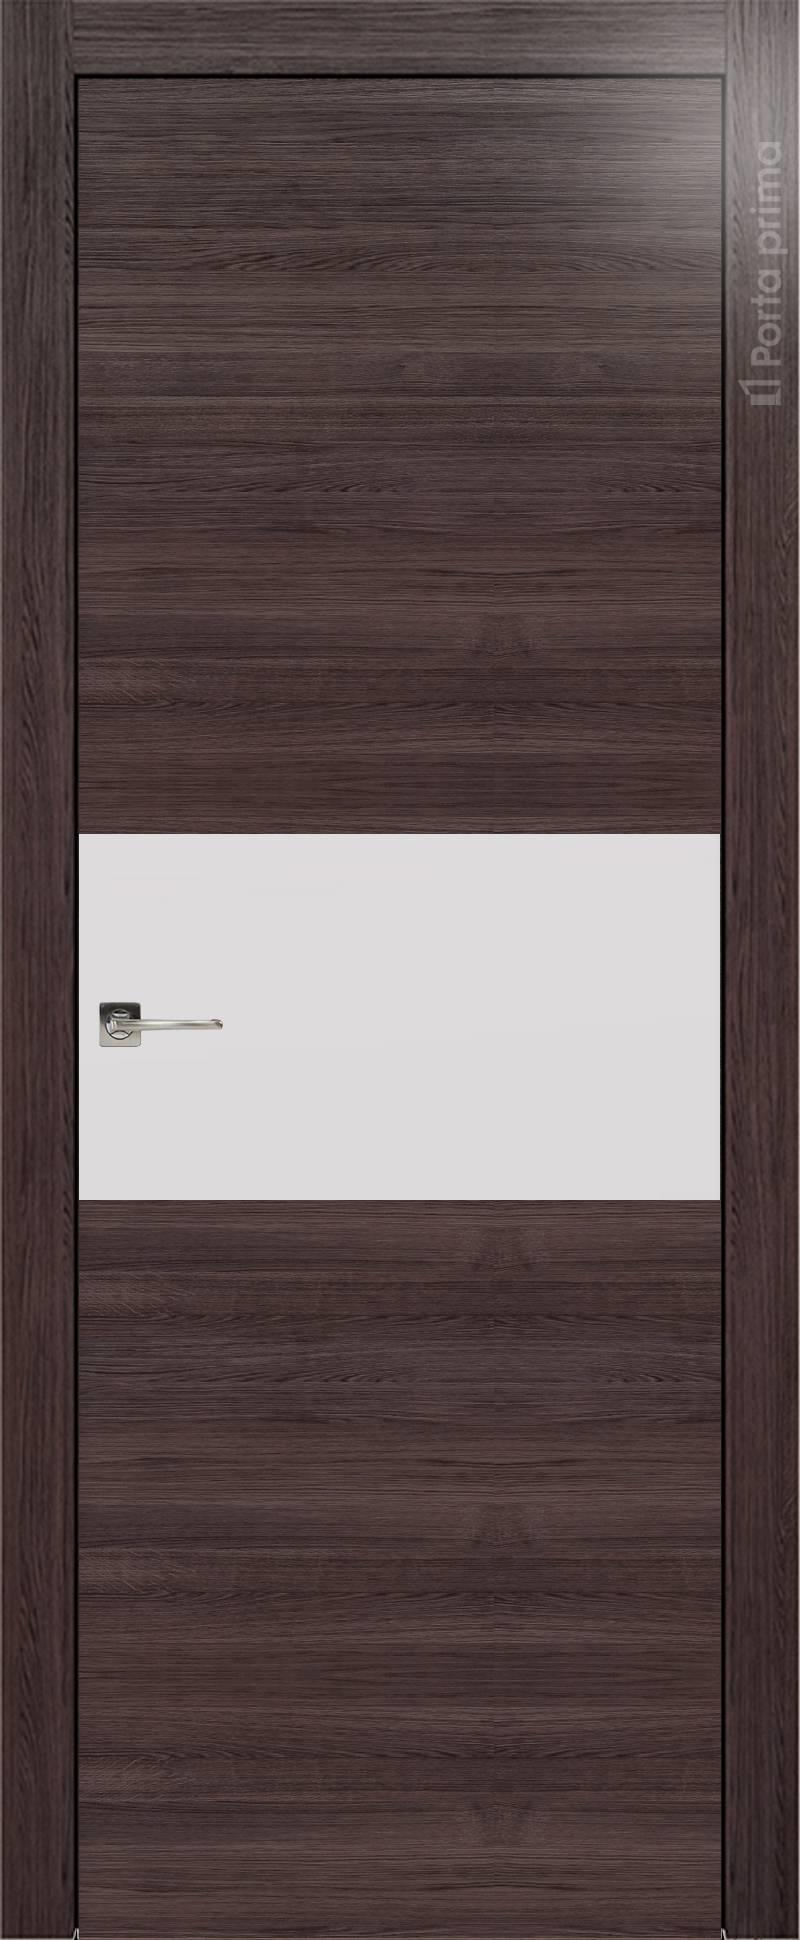 Tivoli Е-4 цвет - Венге Нуар Без стекла (ДГ)